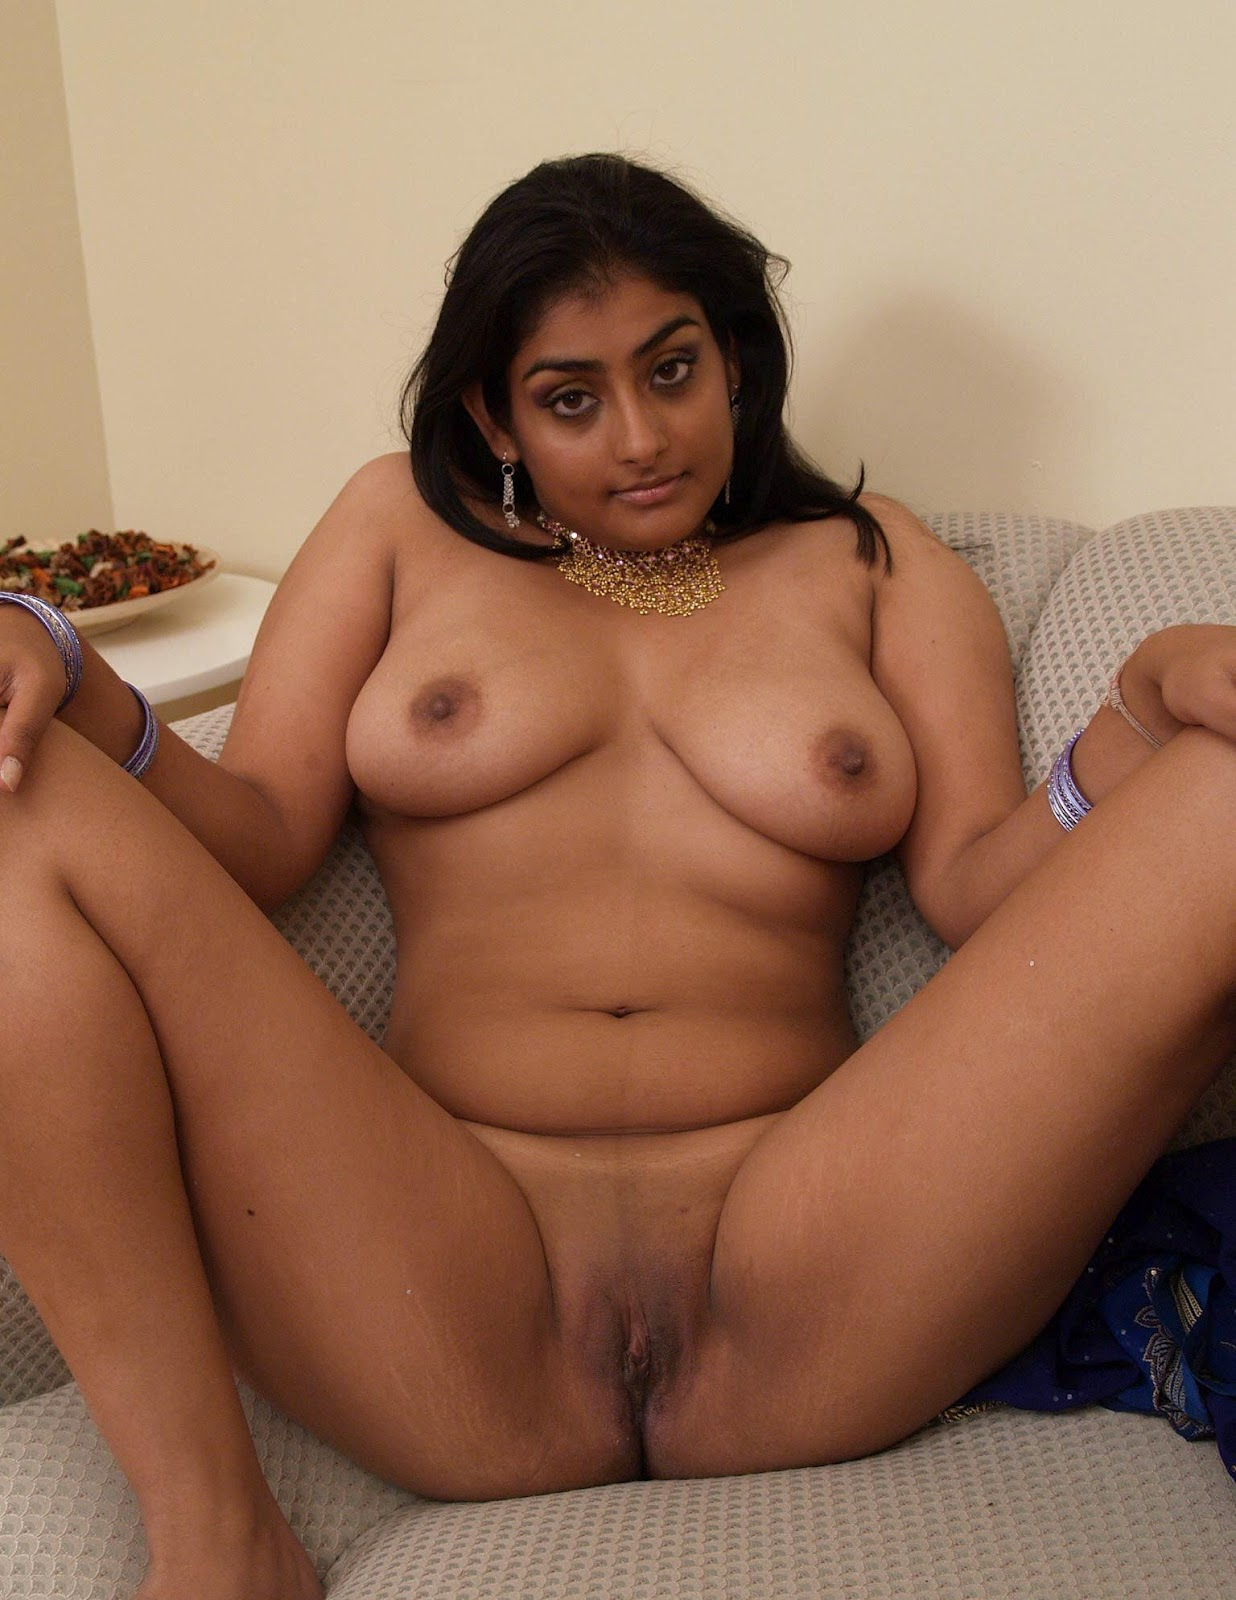 Free Naked Photos Of Women 104